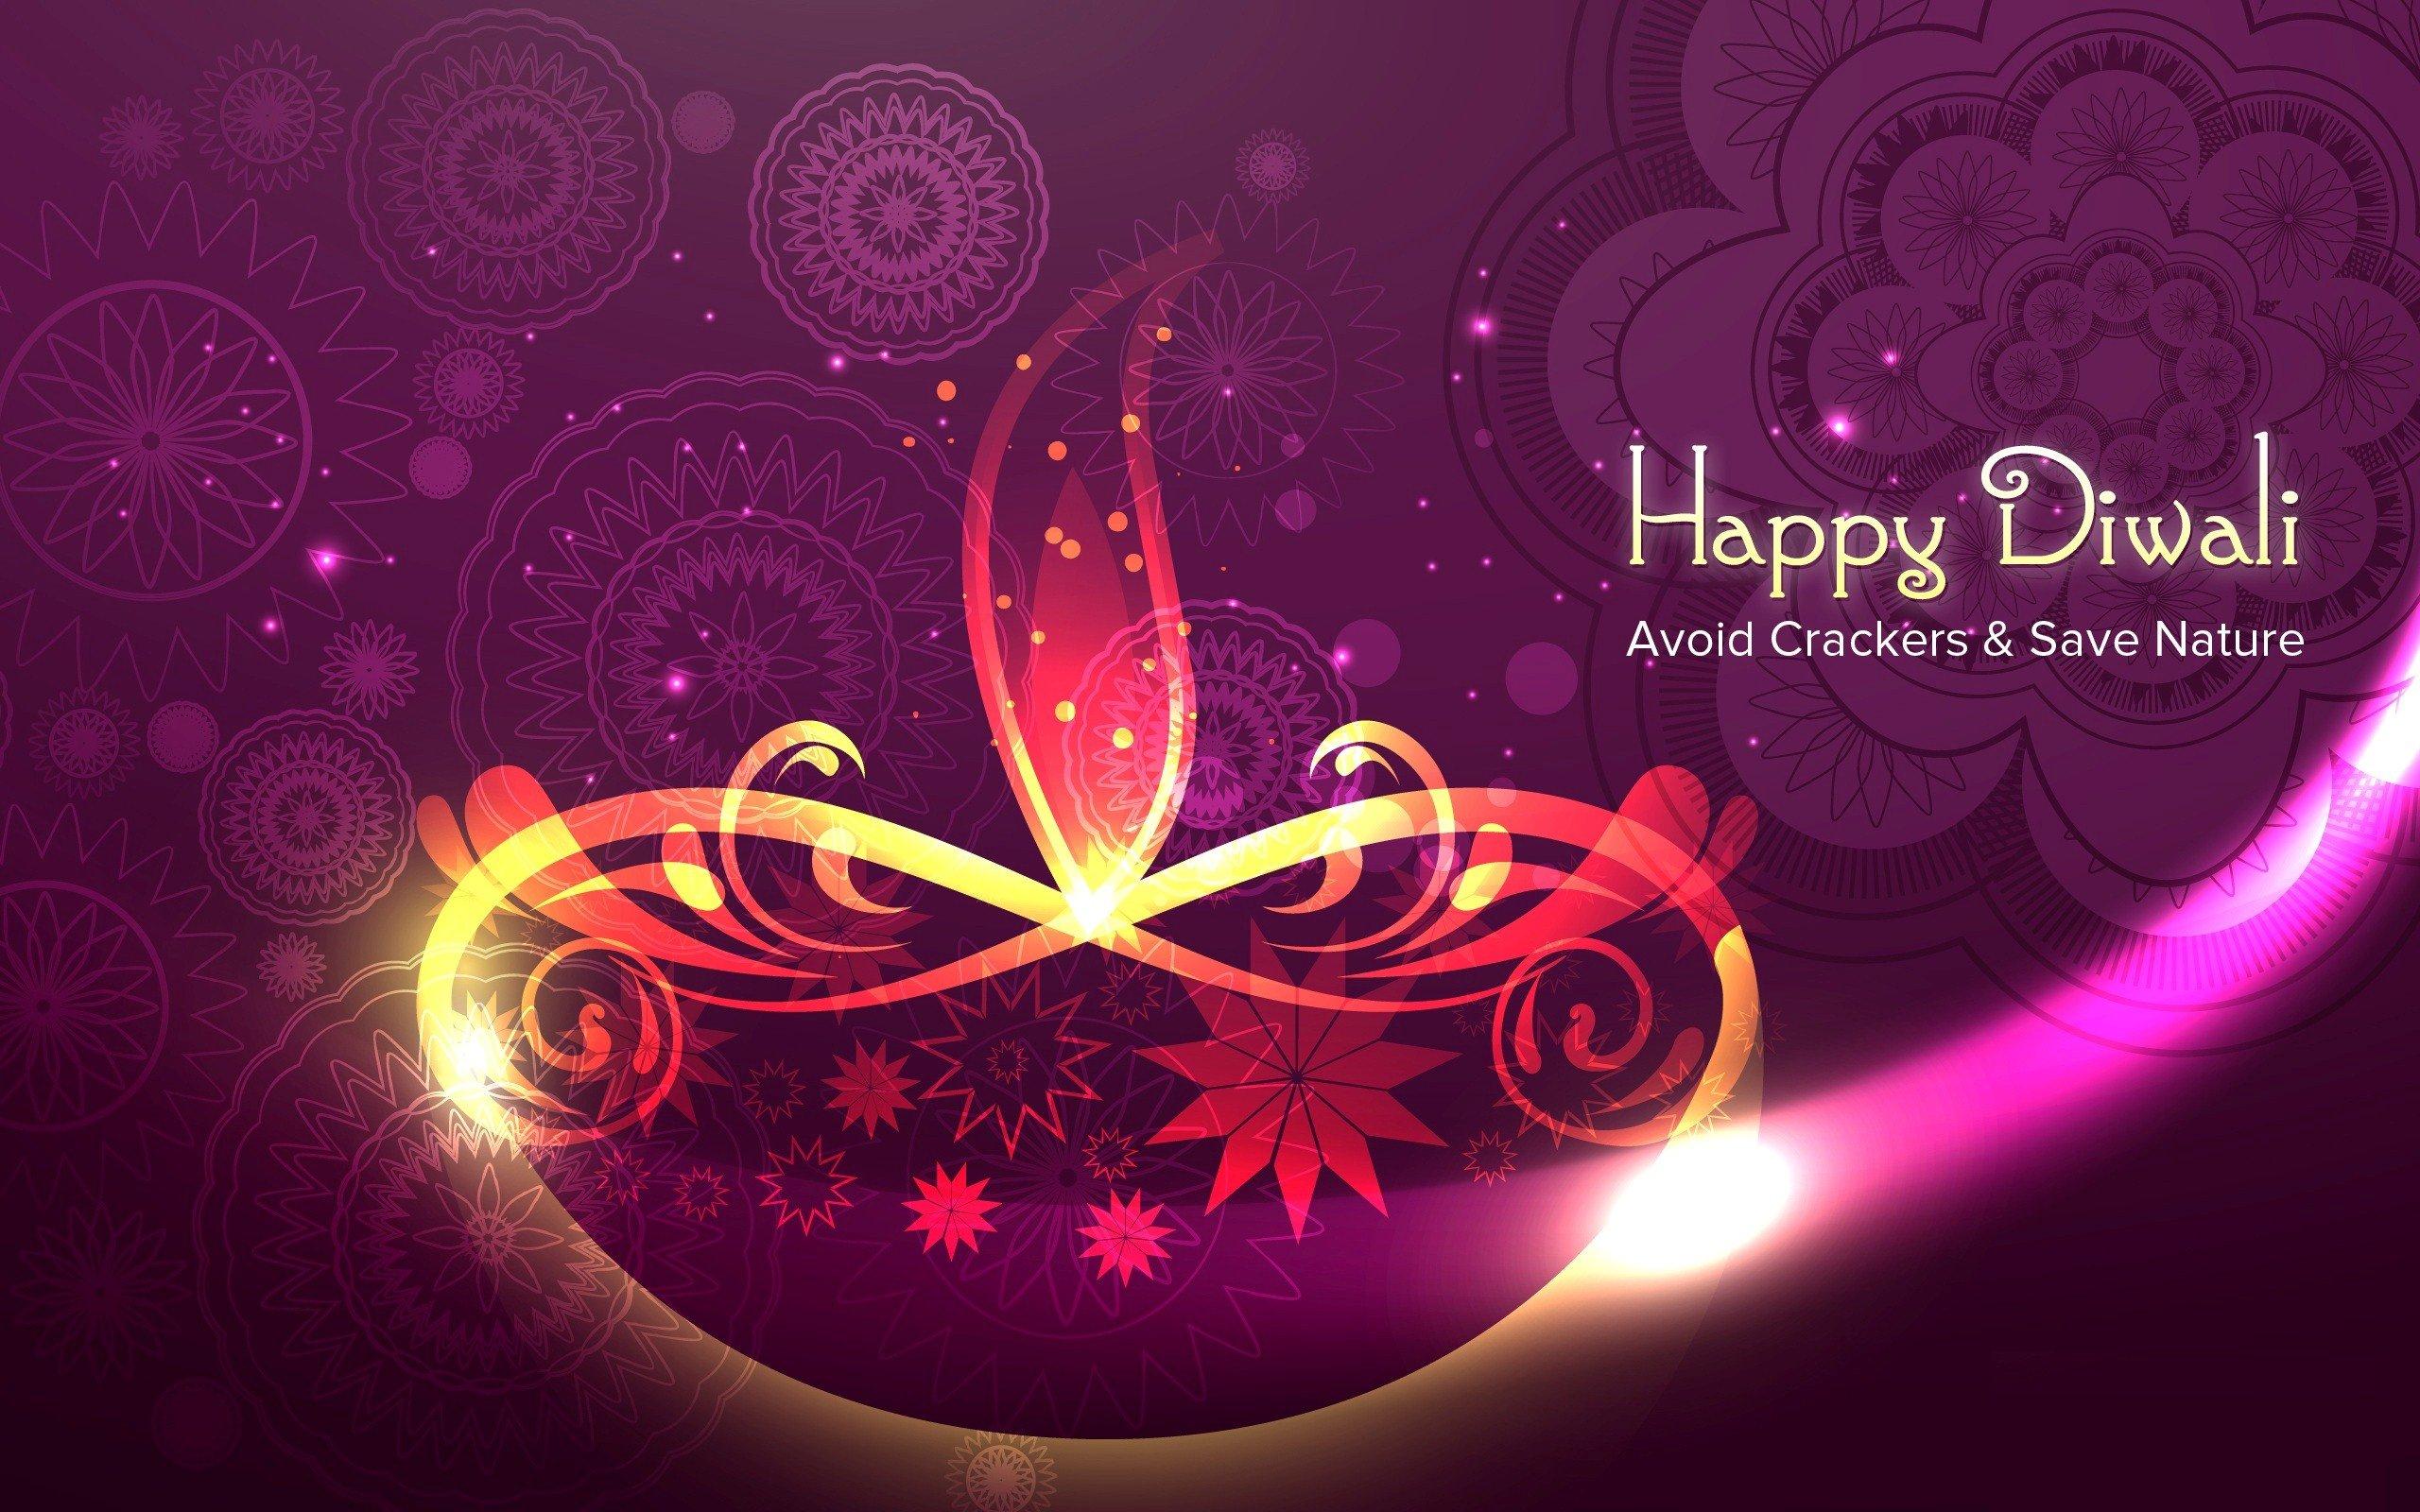 Diwali HD Images For WhatsApp